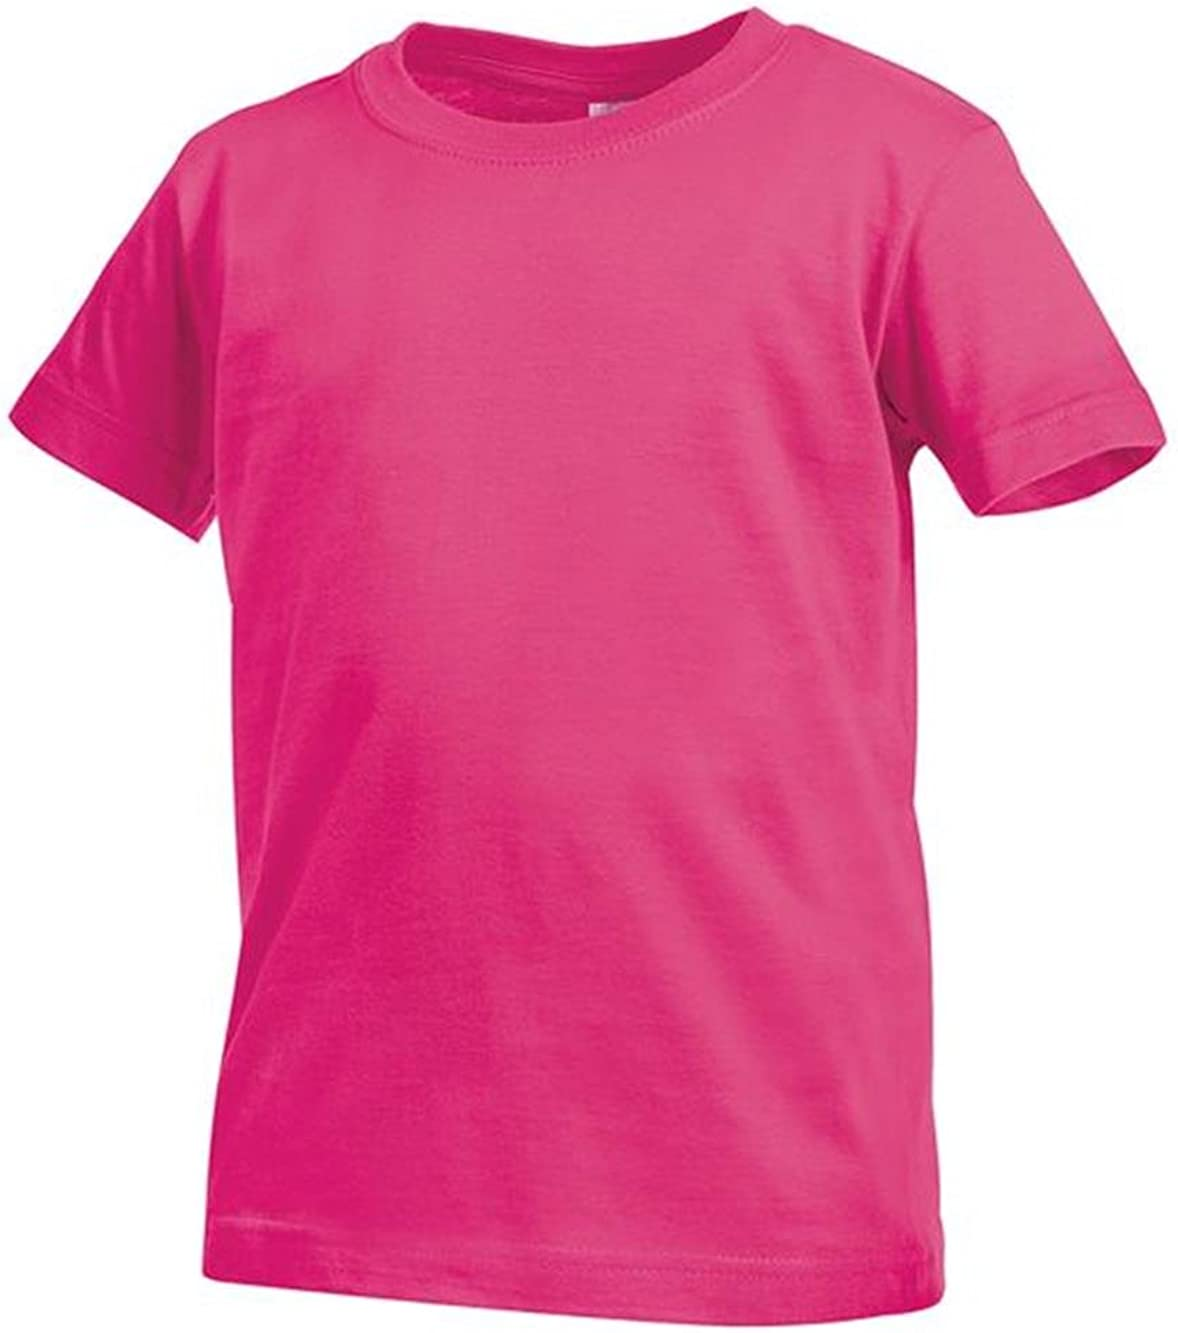 T-Shirt Bimbo Girocollo Maniche Corte Stedman